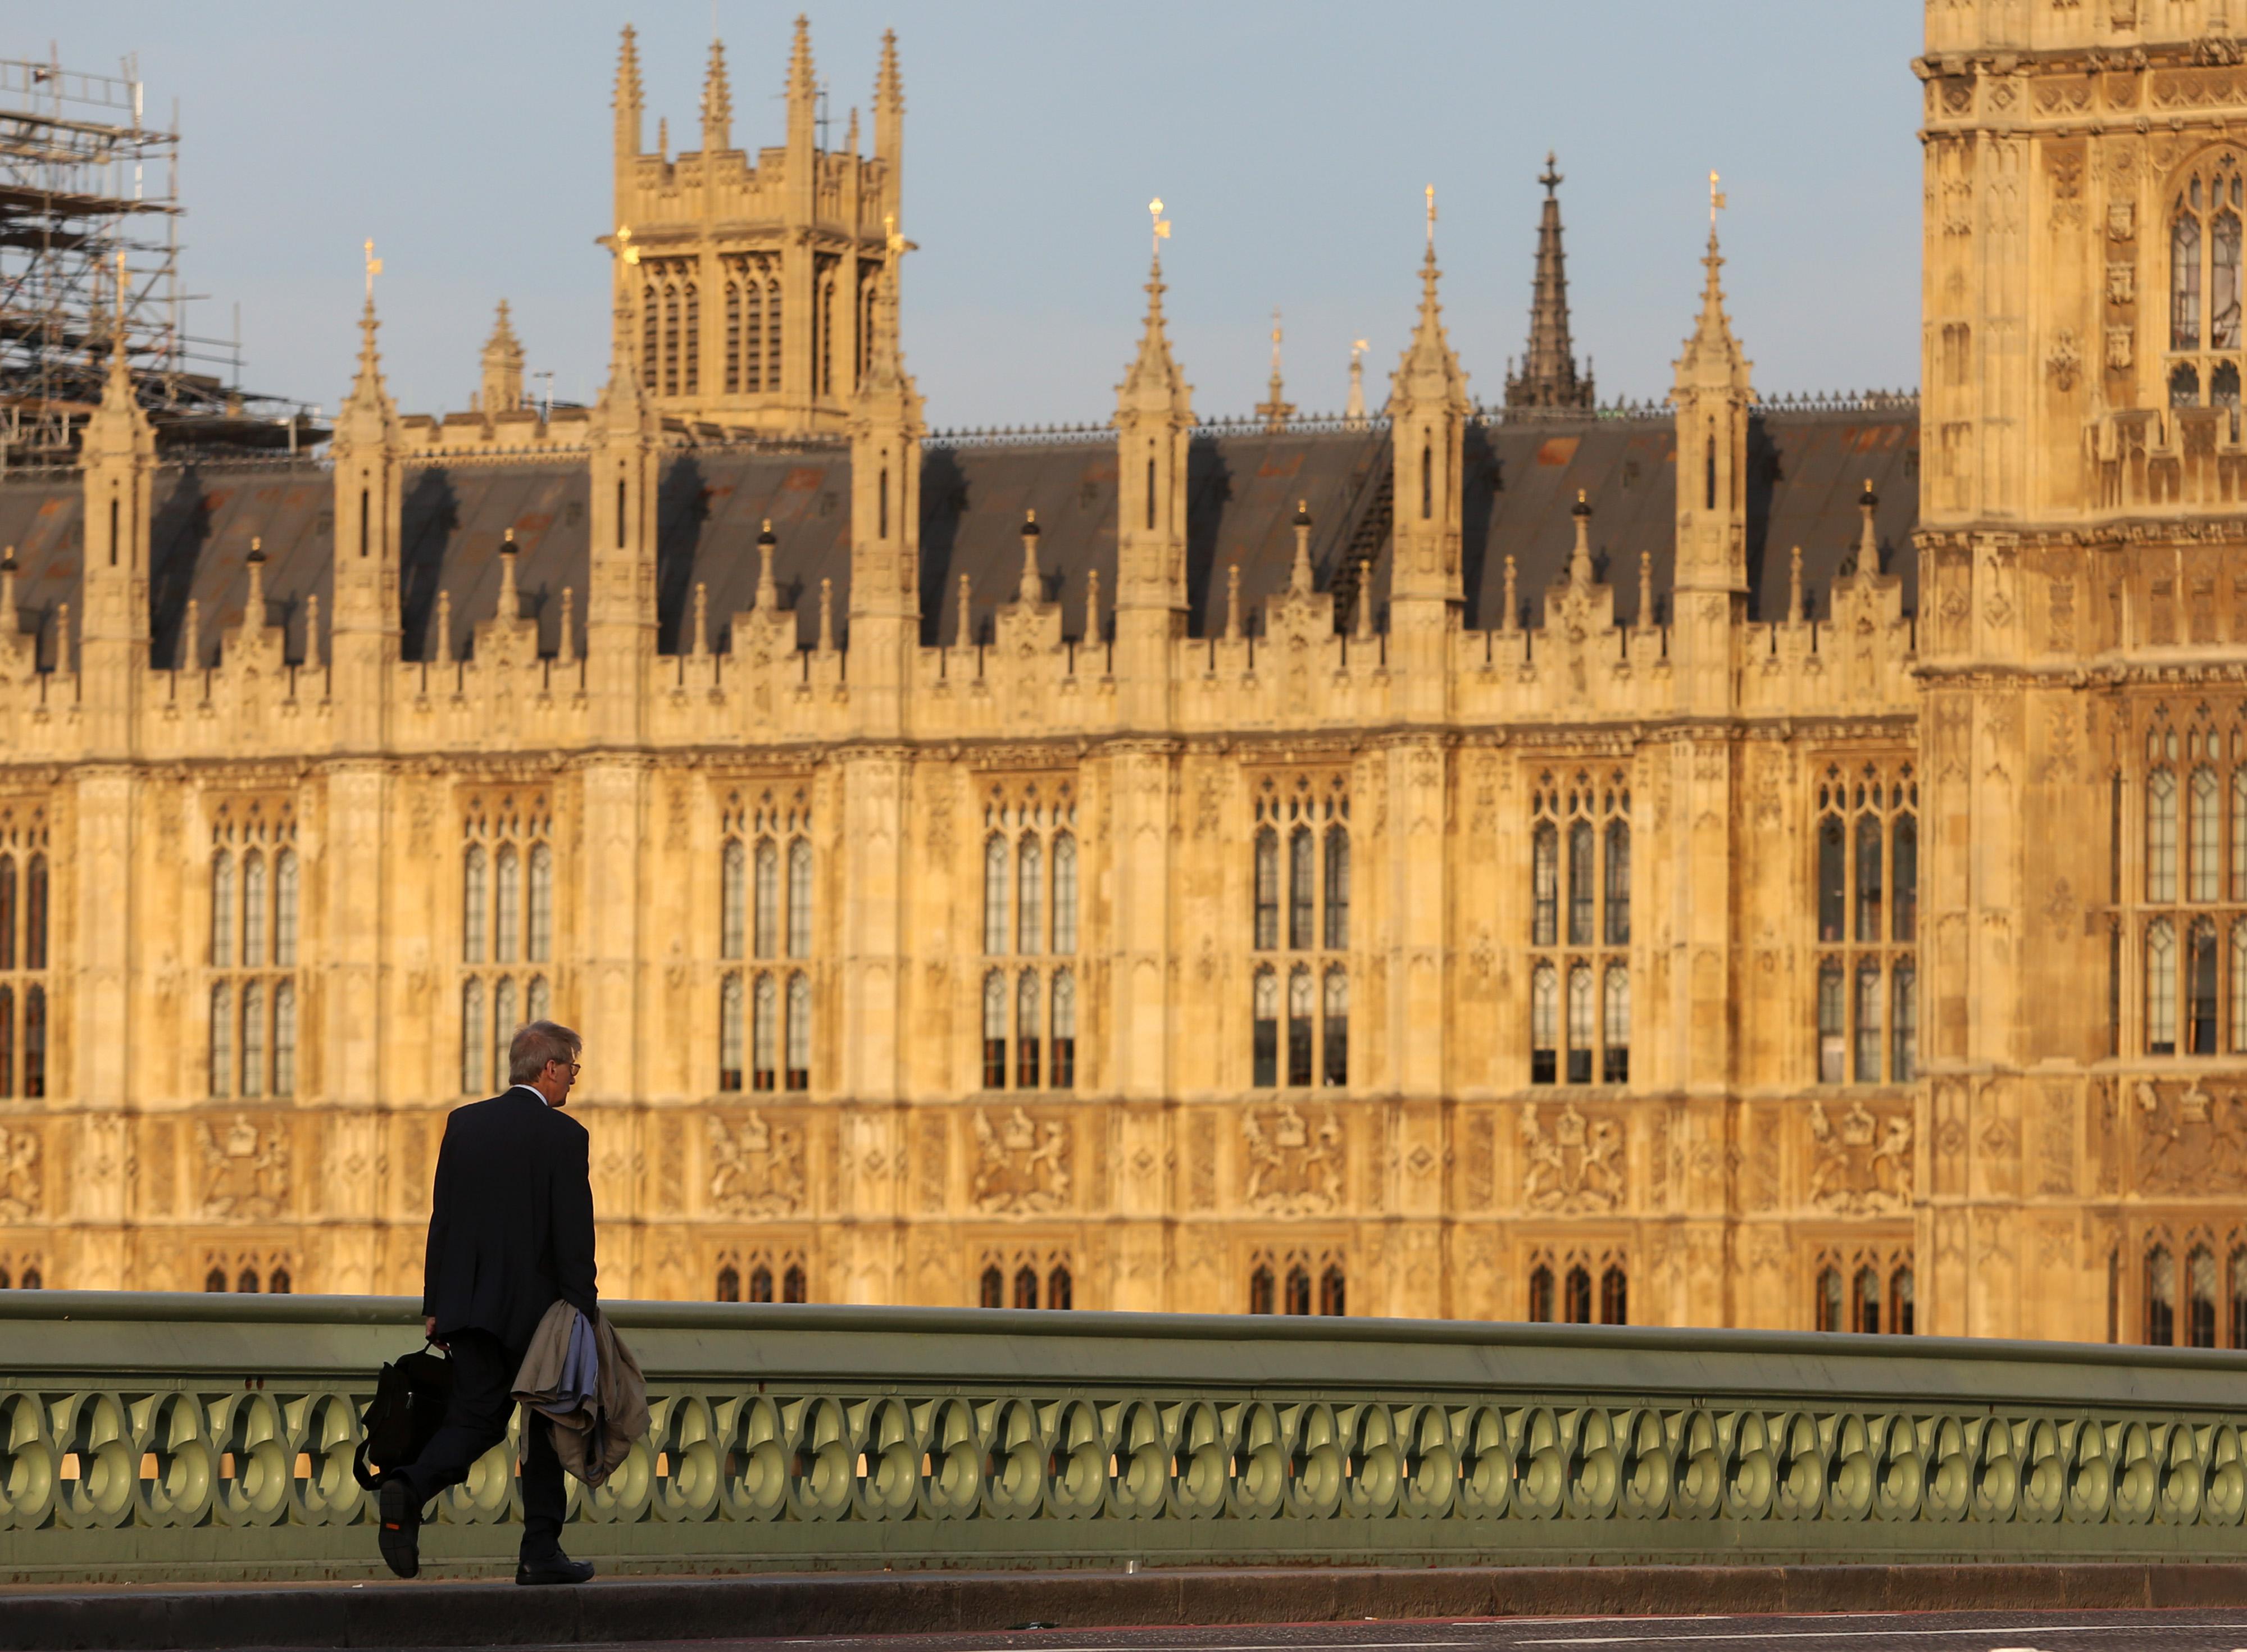 A pedestrian walks across Westminster bridge towards the Houses of Parliament in London, U.K.